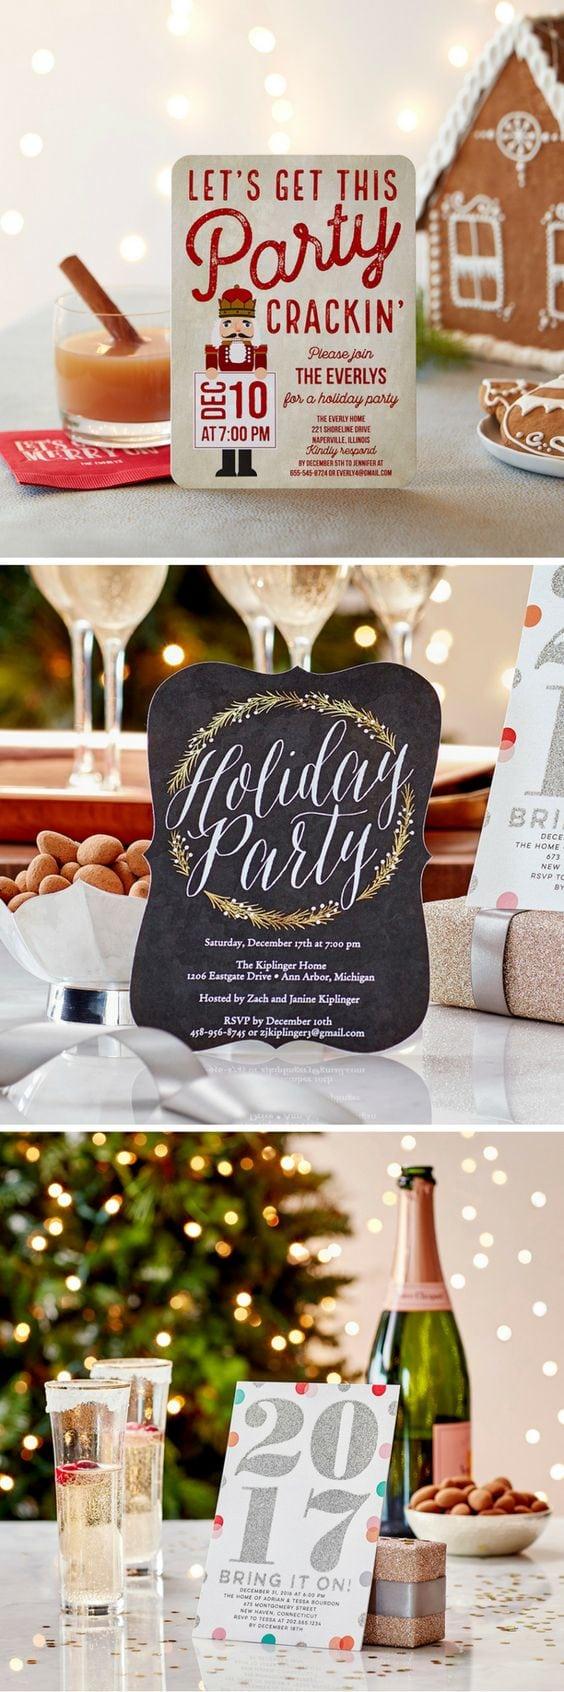 Create Custom Holiday Party Invitations + Photo Christmas Party